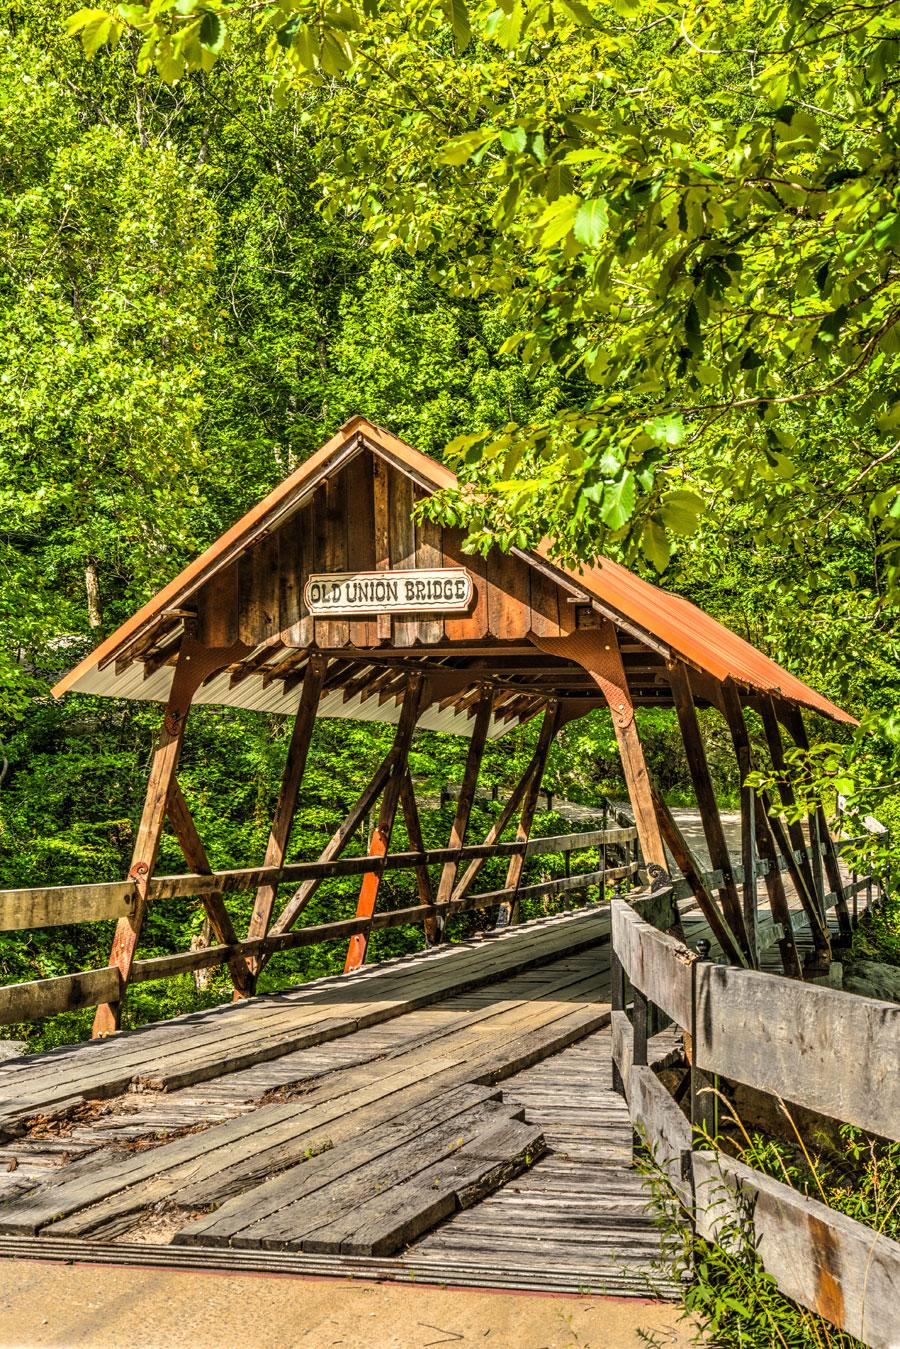 Old Union Covered Bridge